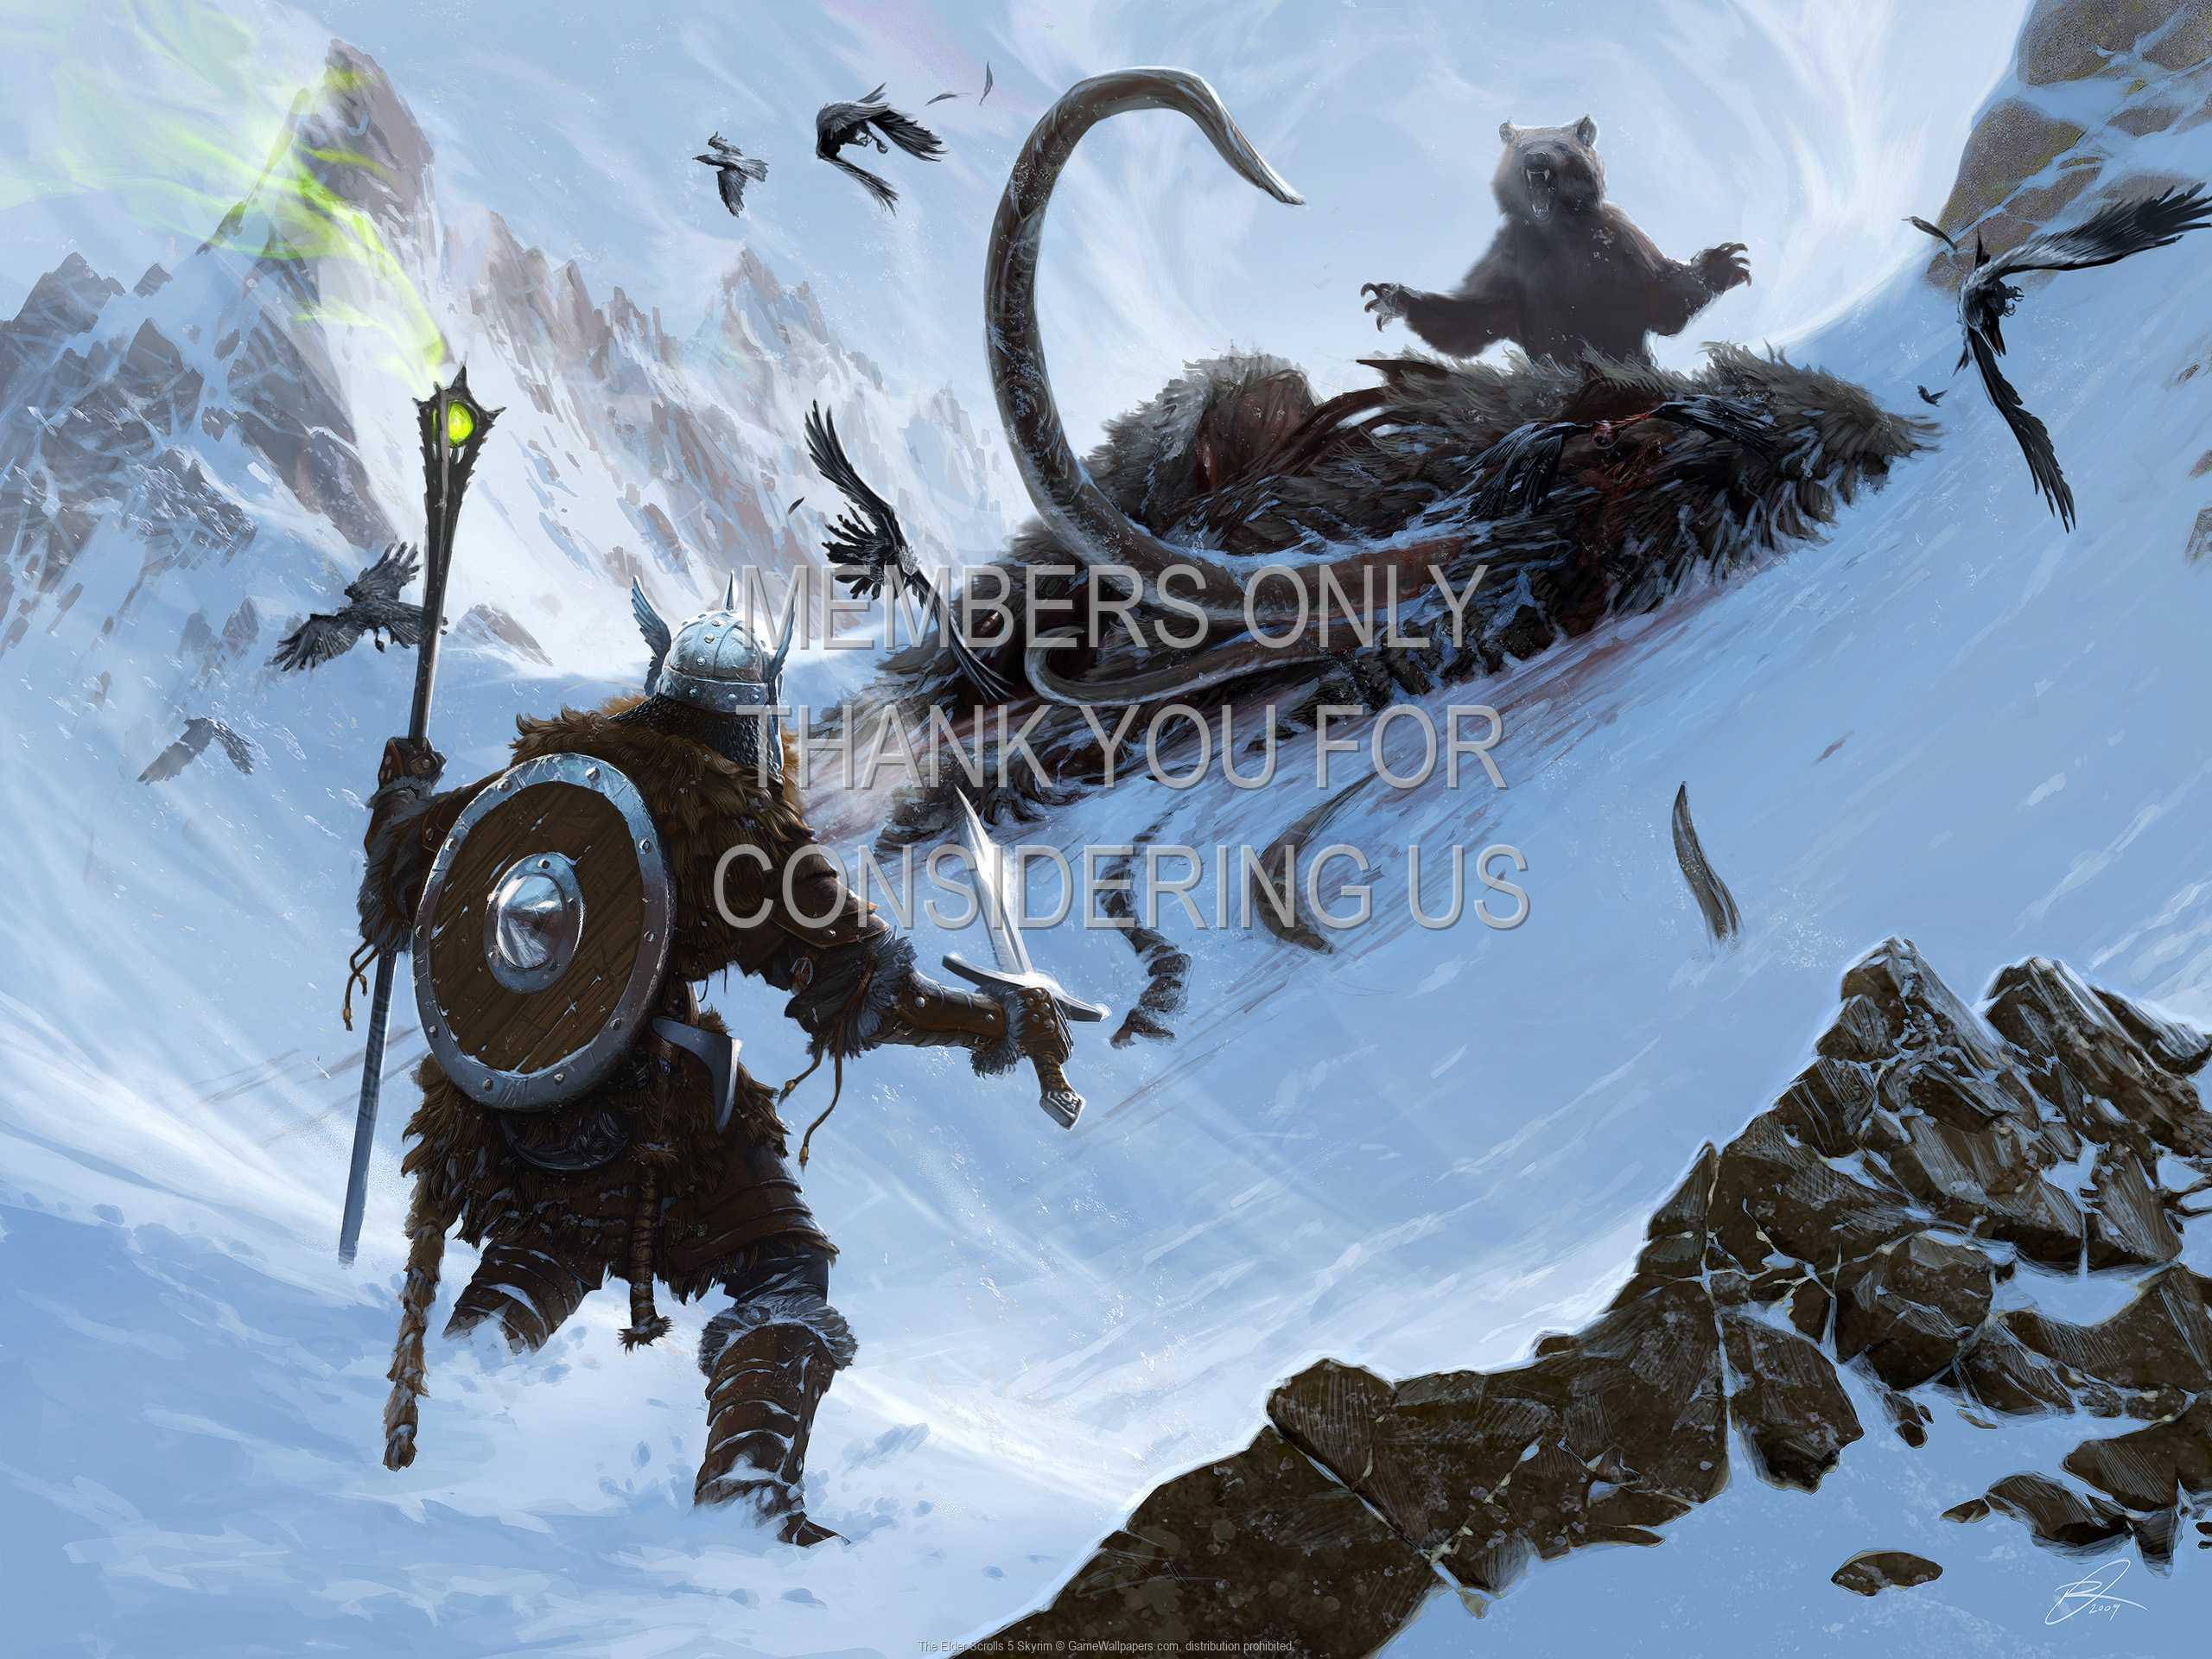 The Elder Scrolls 5: Skyrim 1080p Horizontal Handy Hintergrundbild 02